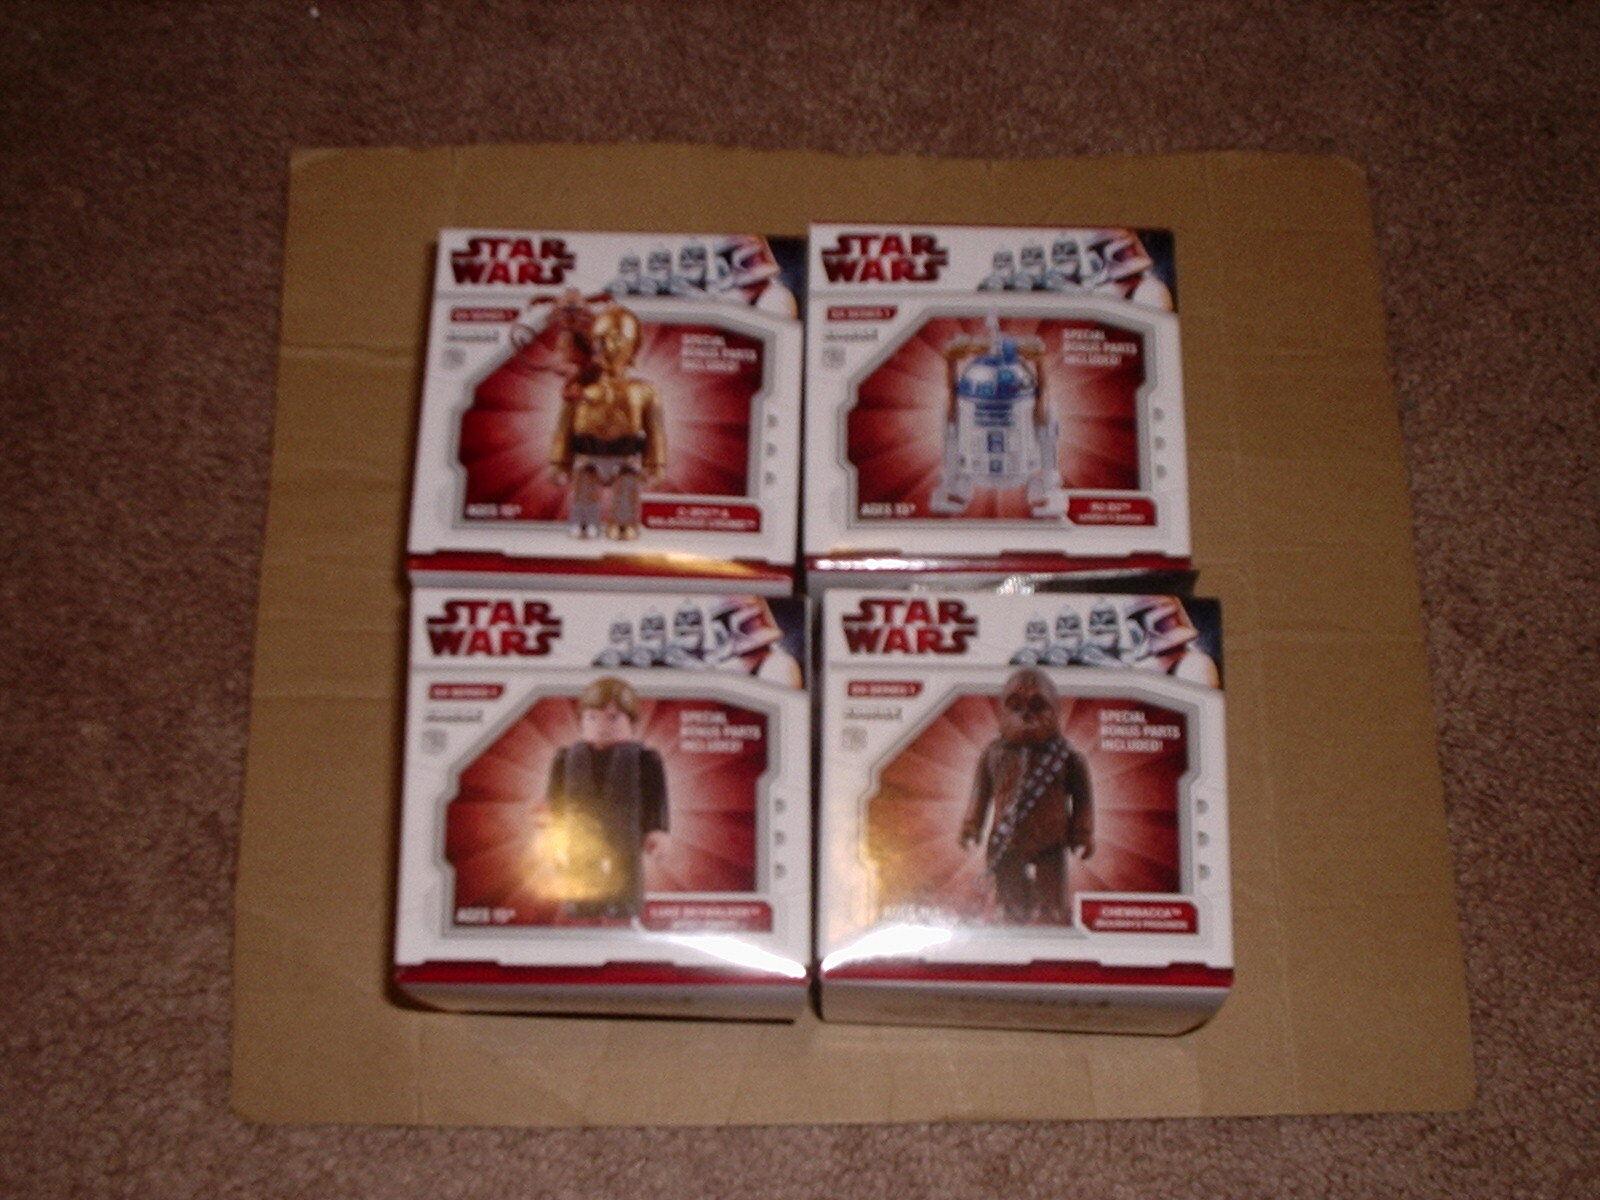 MEDICOM Stern WARS KUBRICK DX1 serie 1 R2-D2 C-3PO LUKE CHEWBACCA SET OF FOUR